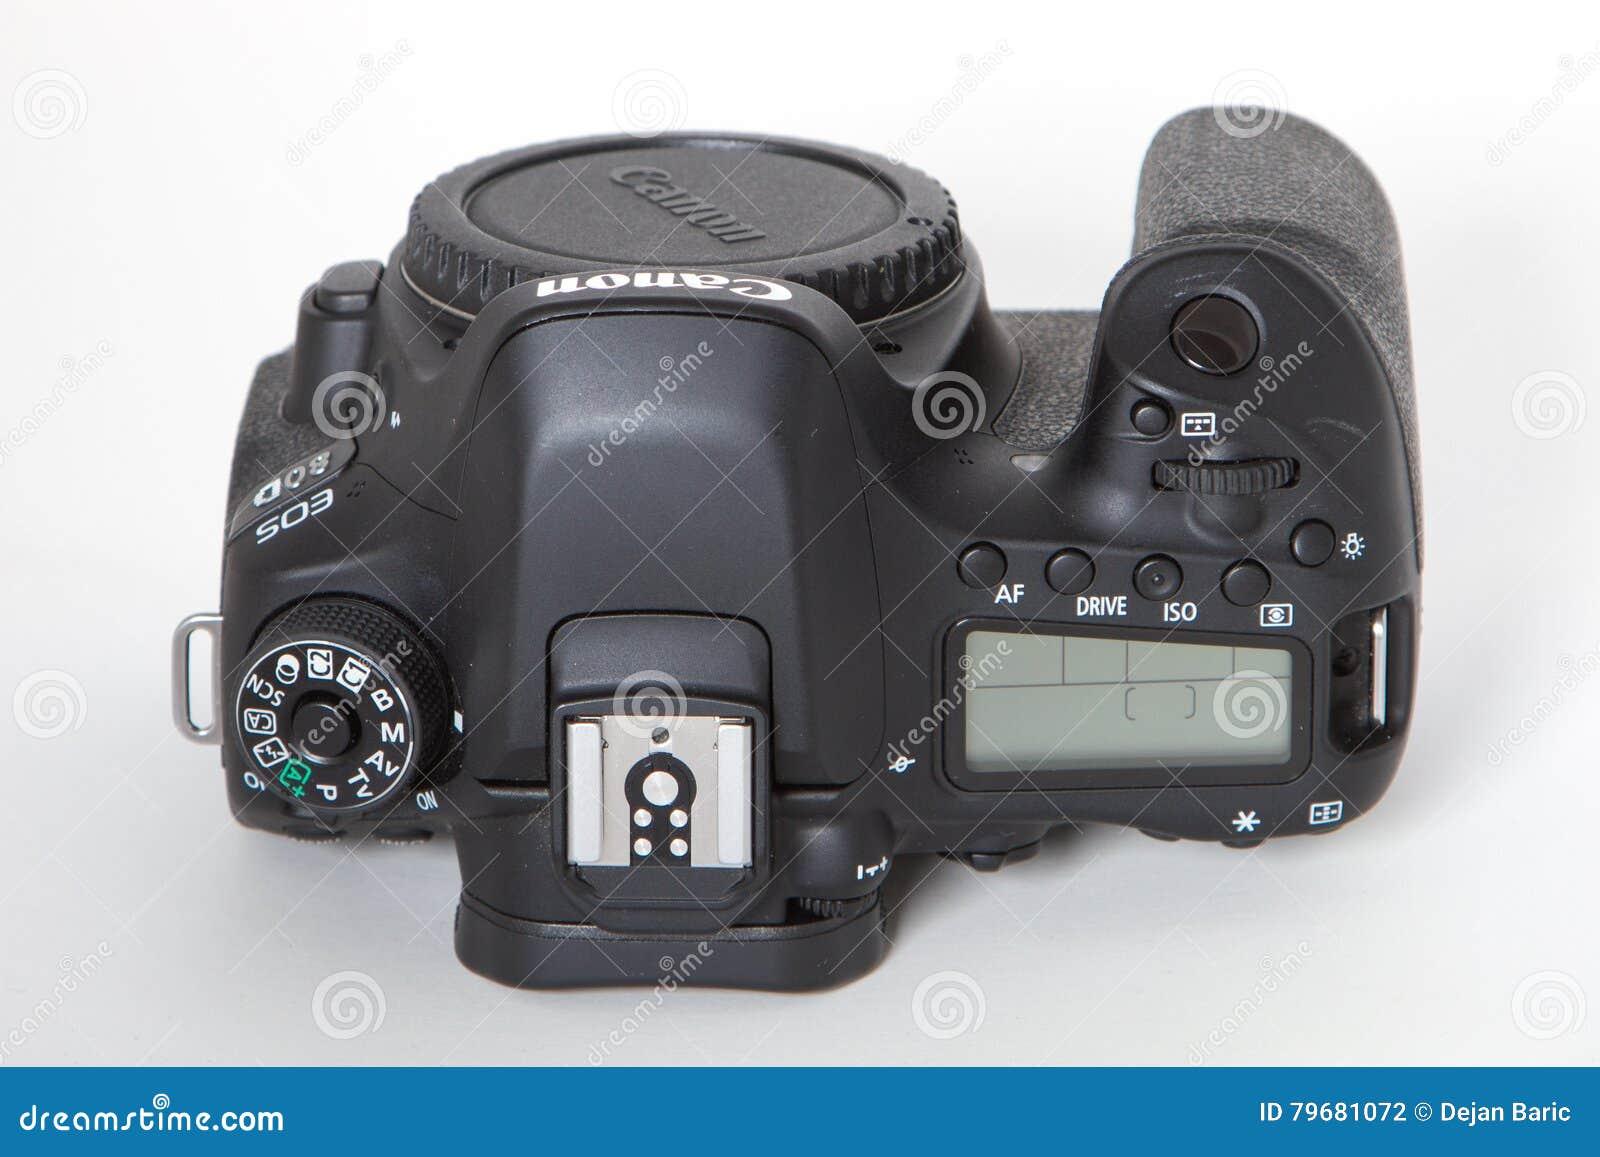 Canon EOS 80D DSLR camera editorial photography  Image of